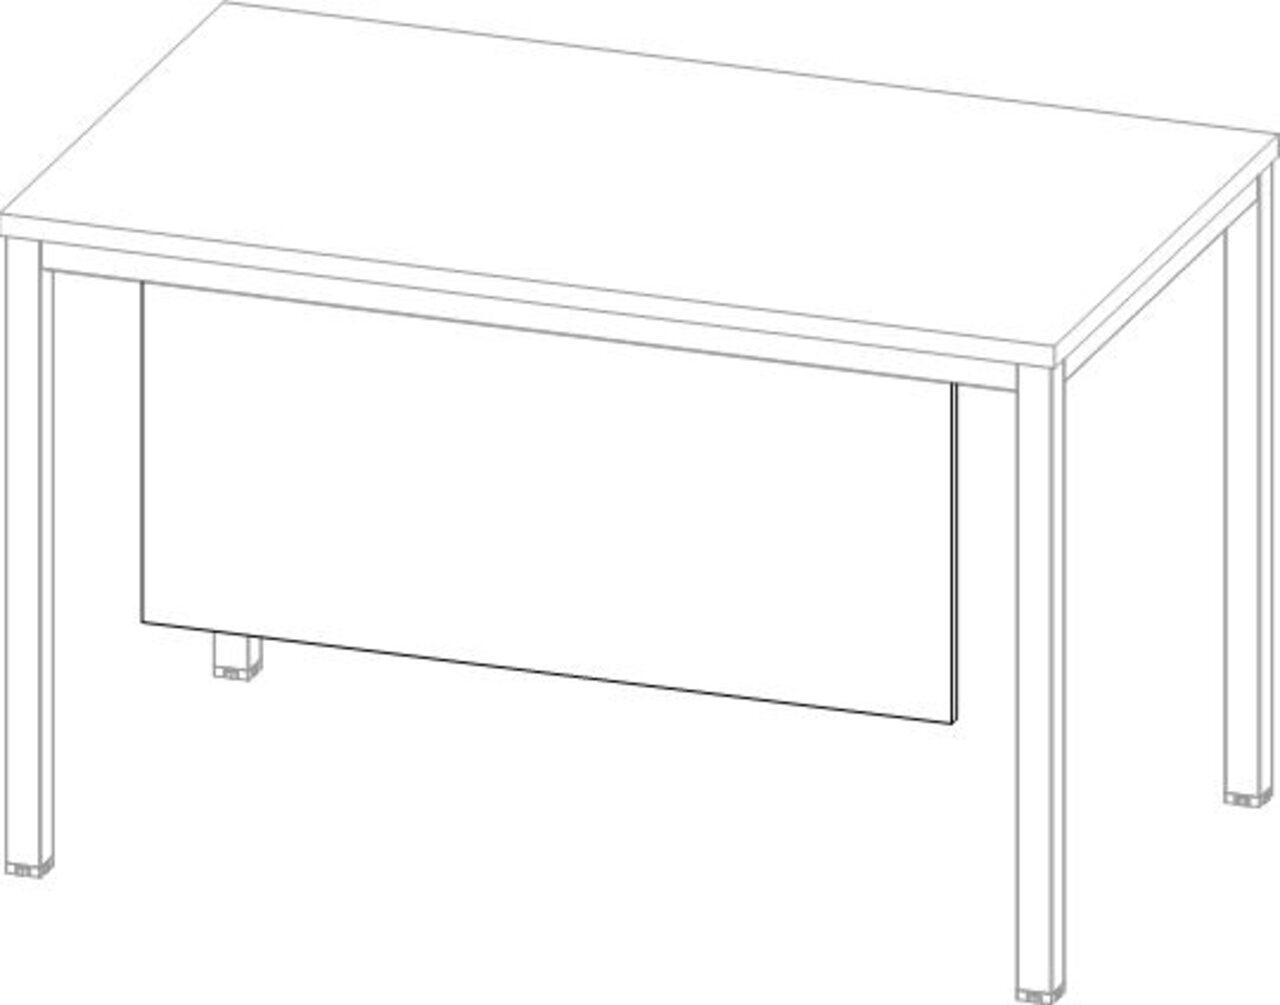 Царга к столу - фото 3